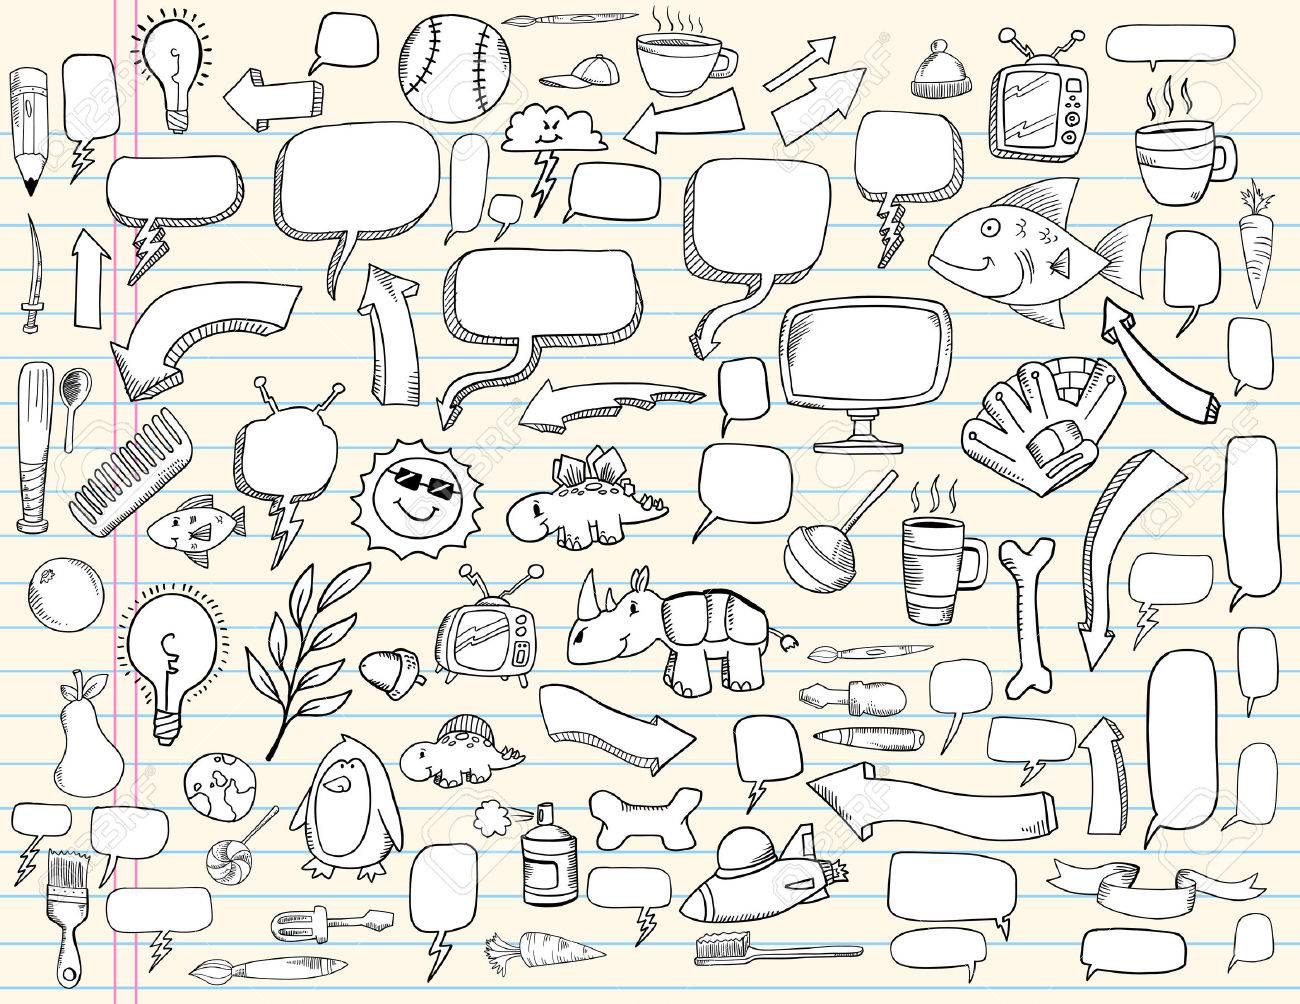 Notebook Doodle Speech Bubble Design Elements Mega Illustration Set - 7261095